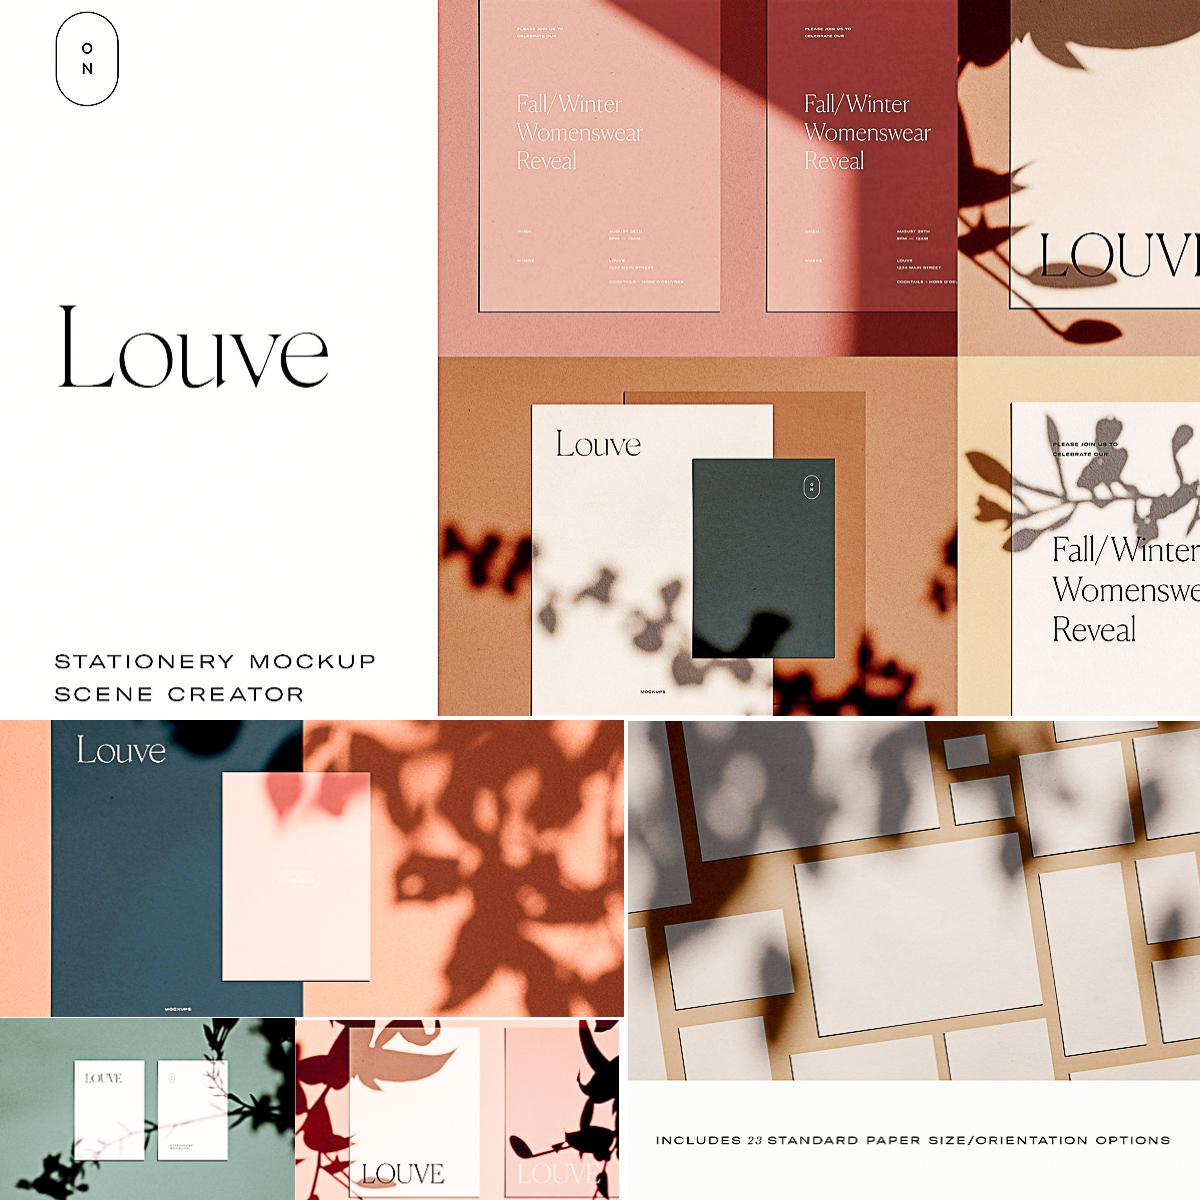 louve mockup kit scene creator free download